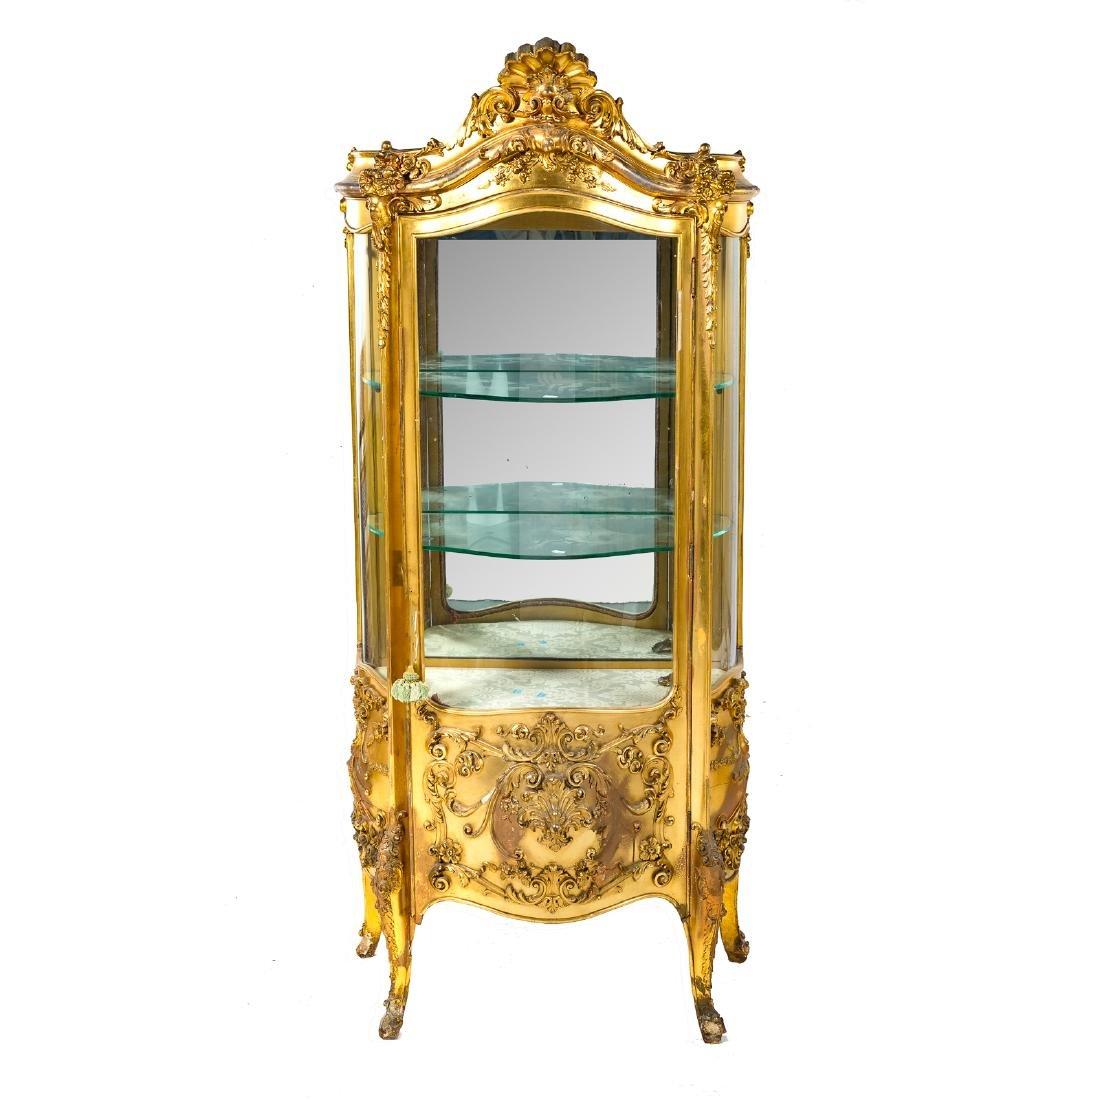 Louis XV style giltwood bombe vitrine - 2